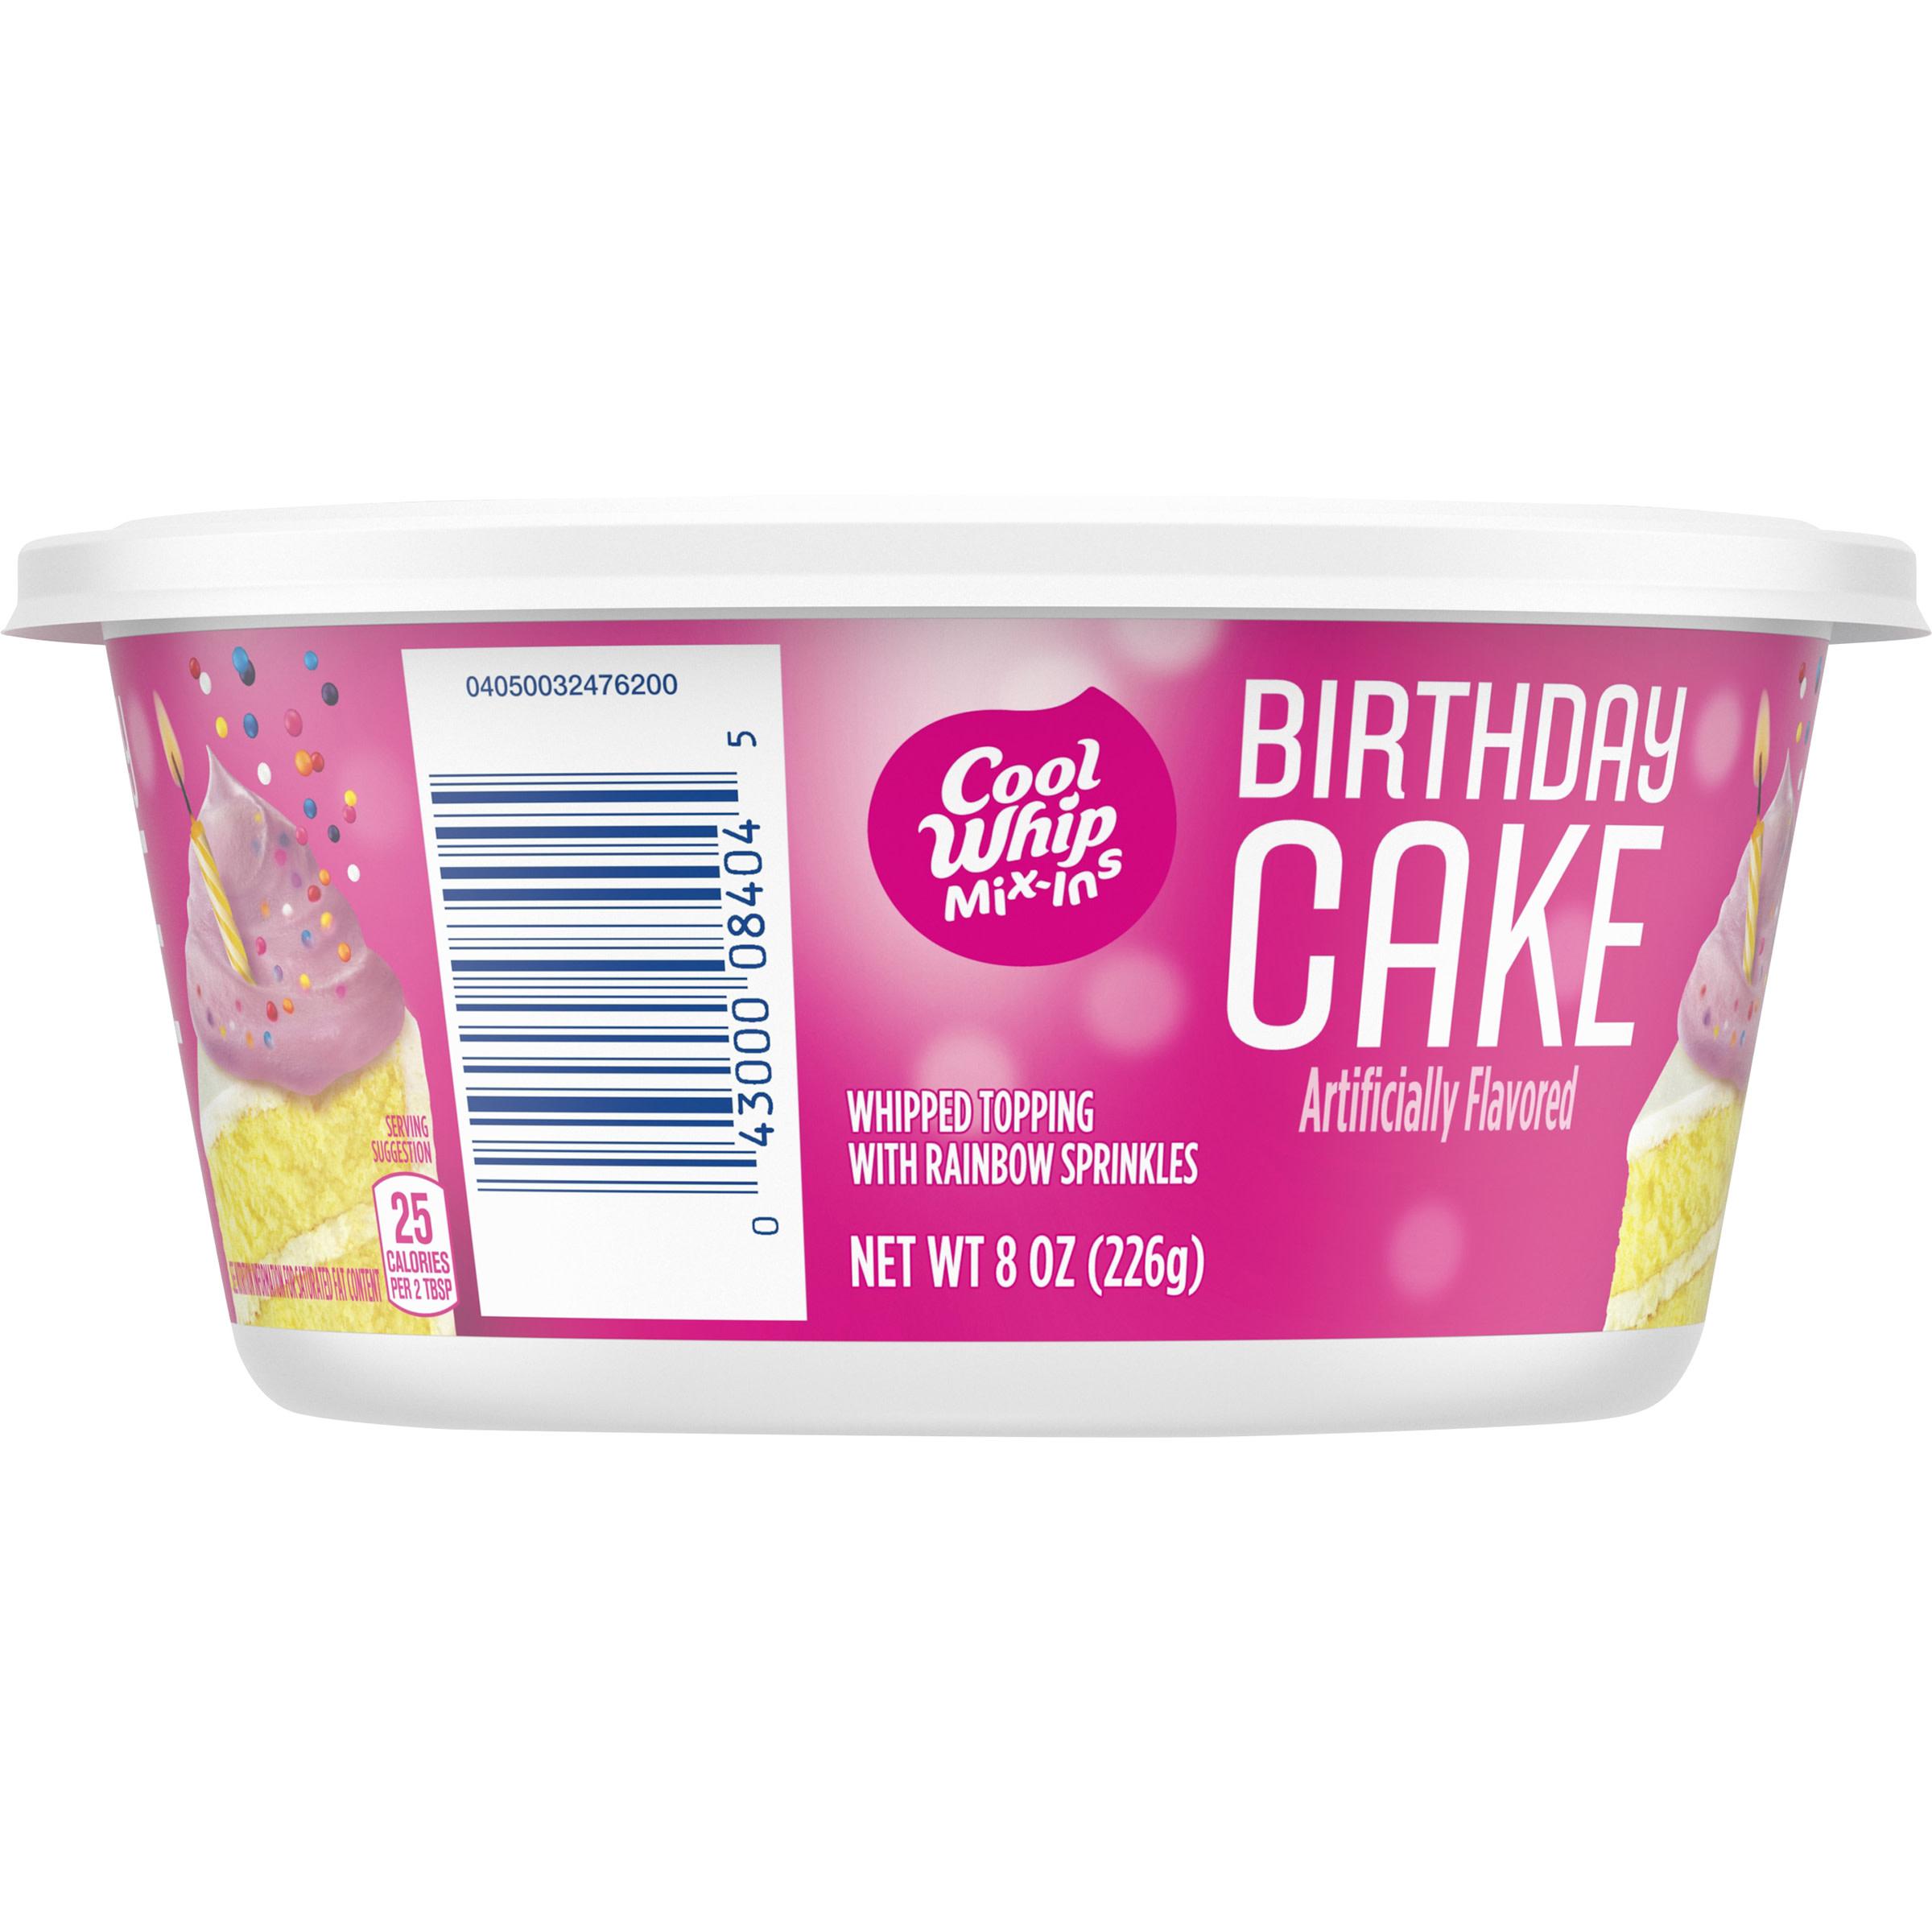 Cool Whip Birthday Cake With Rainbow Sprinkles Frozen Mix Ins 8 Oz Tub Walmart Com Walmart Com